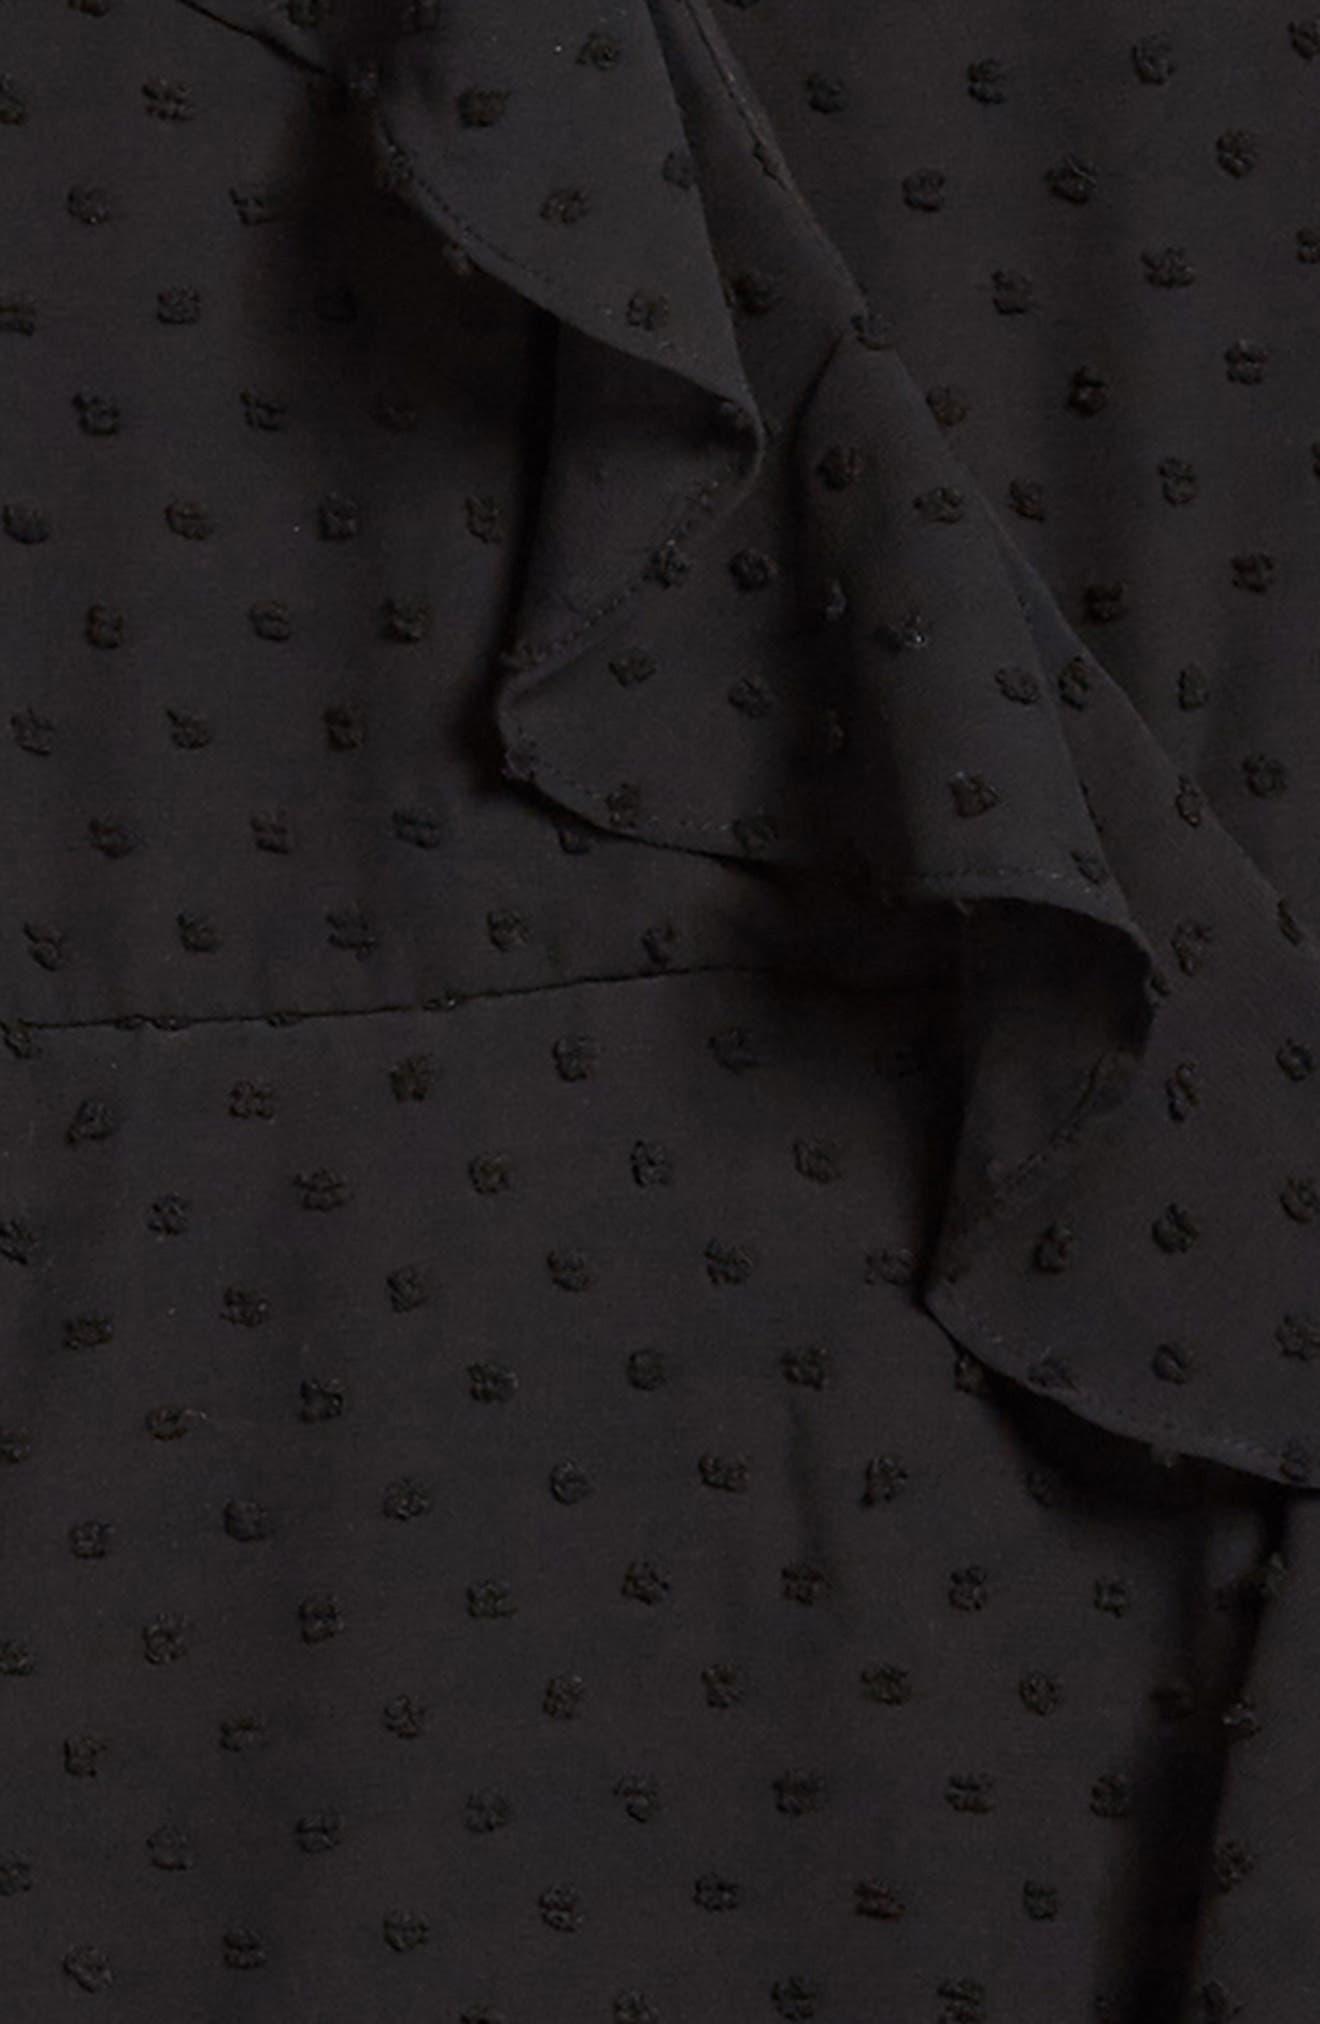 Ruffle Dobby Georgette Dress,                             Alternate thumbnail 3, color,                             Black